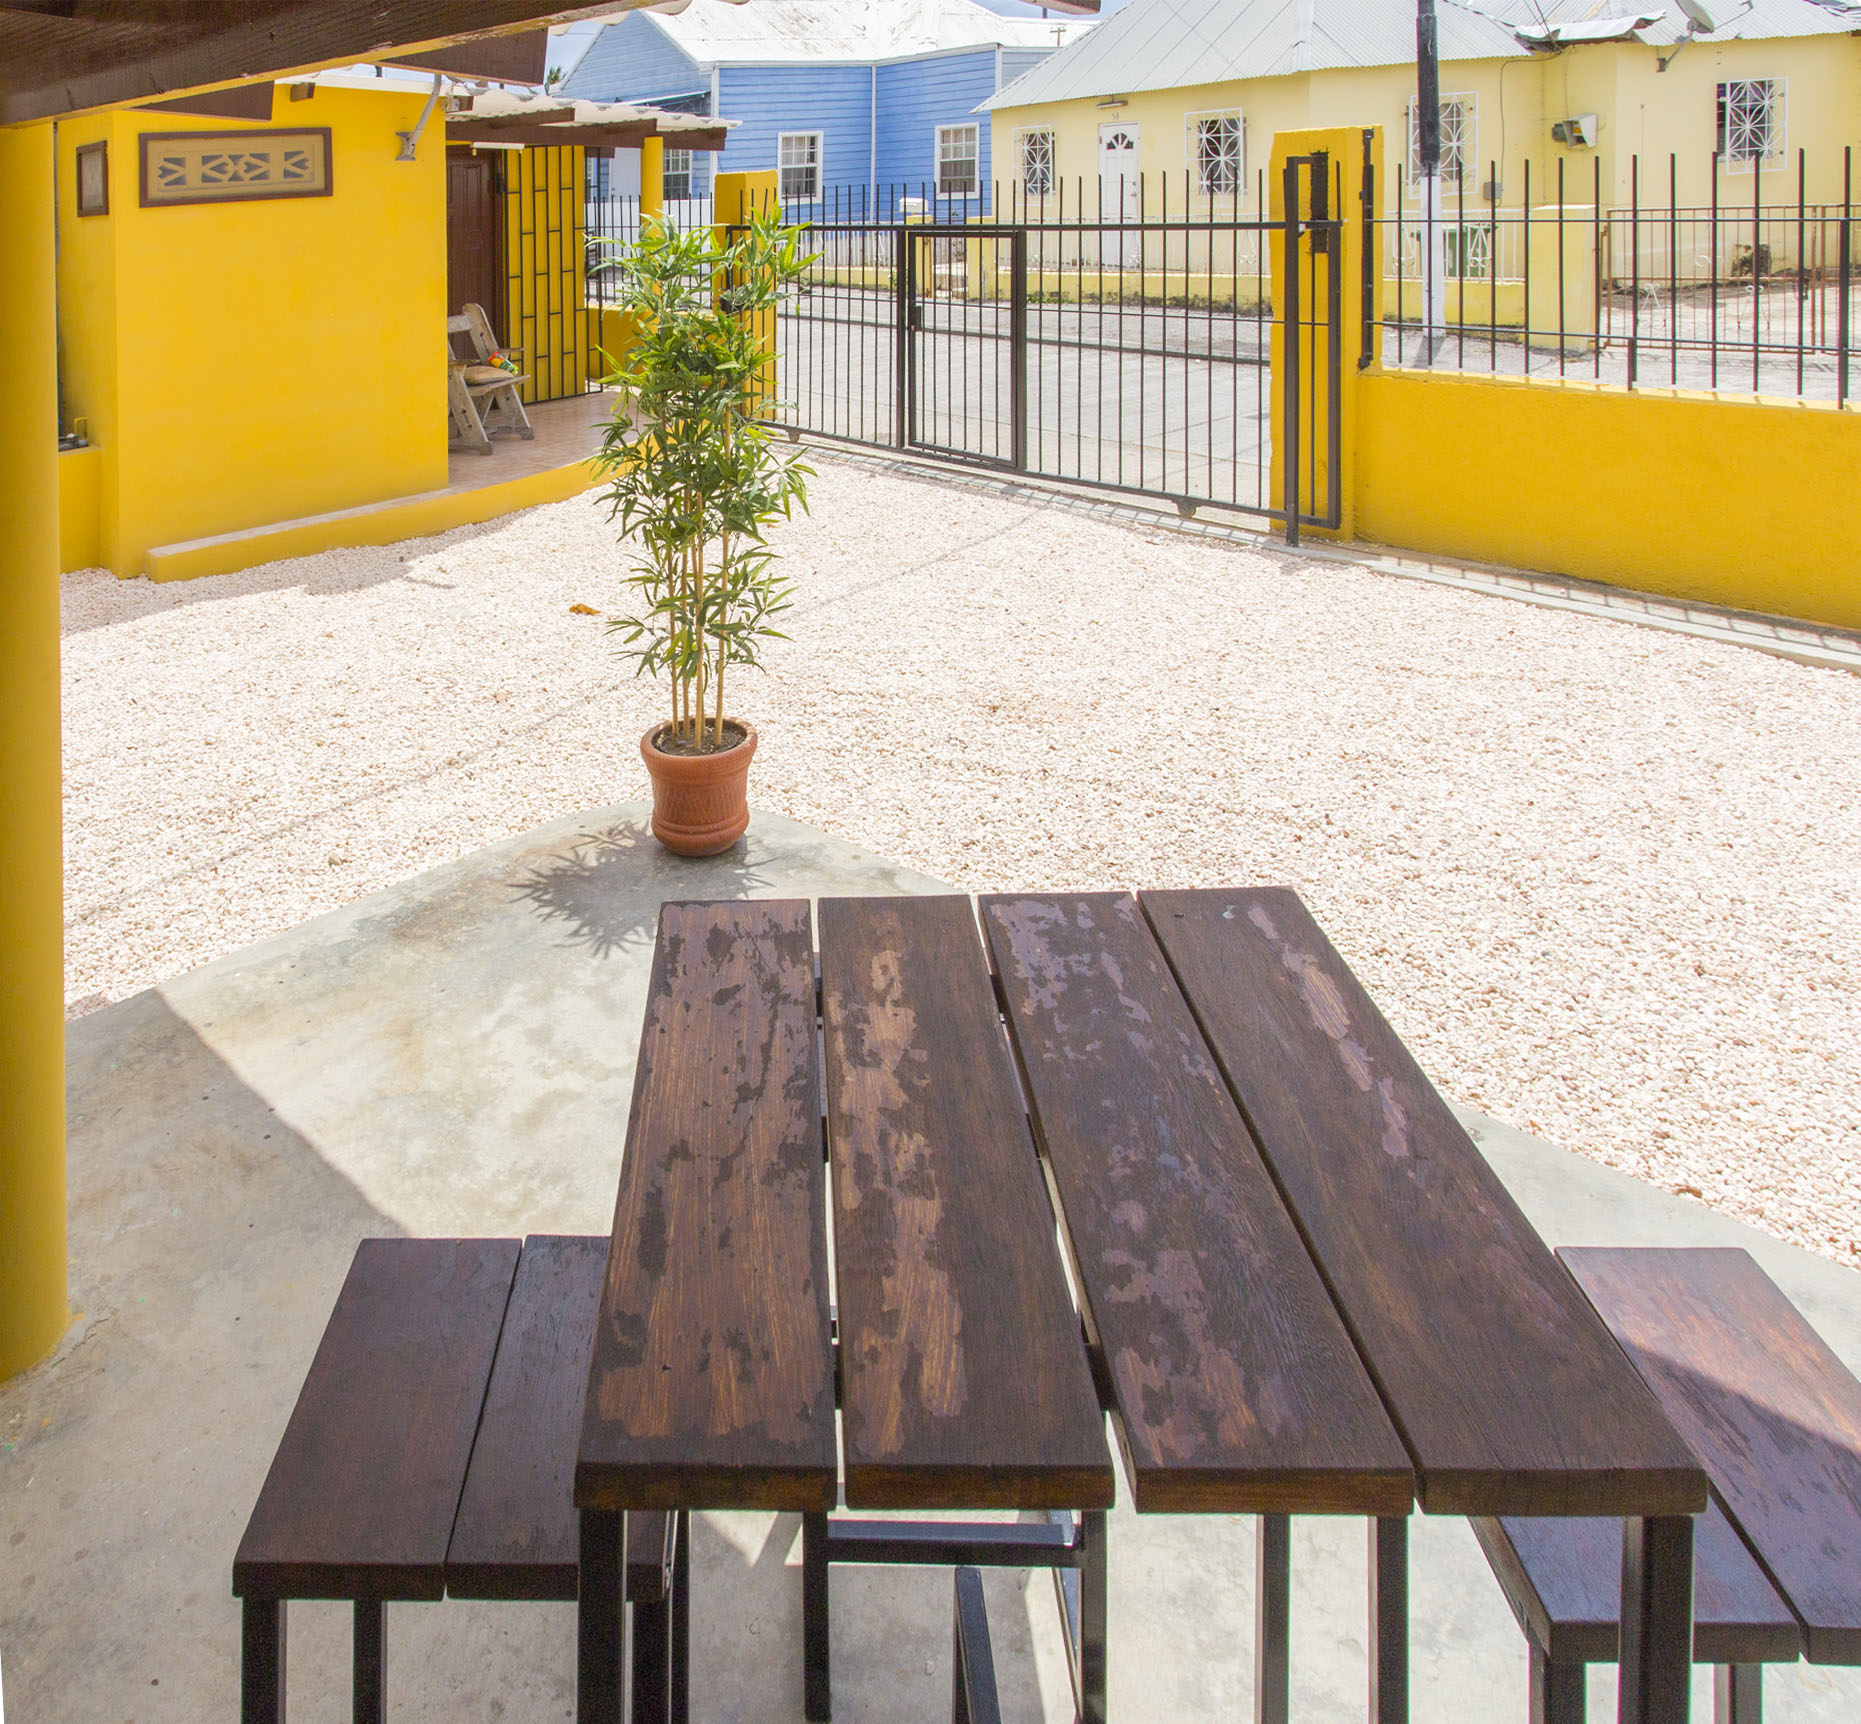 StageDesk-Curaçao-Stagehuis-BergAltena-Pelikaan-huis07.jpg